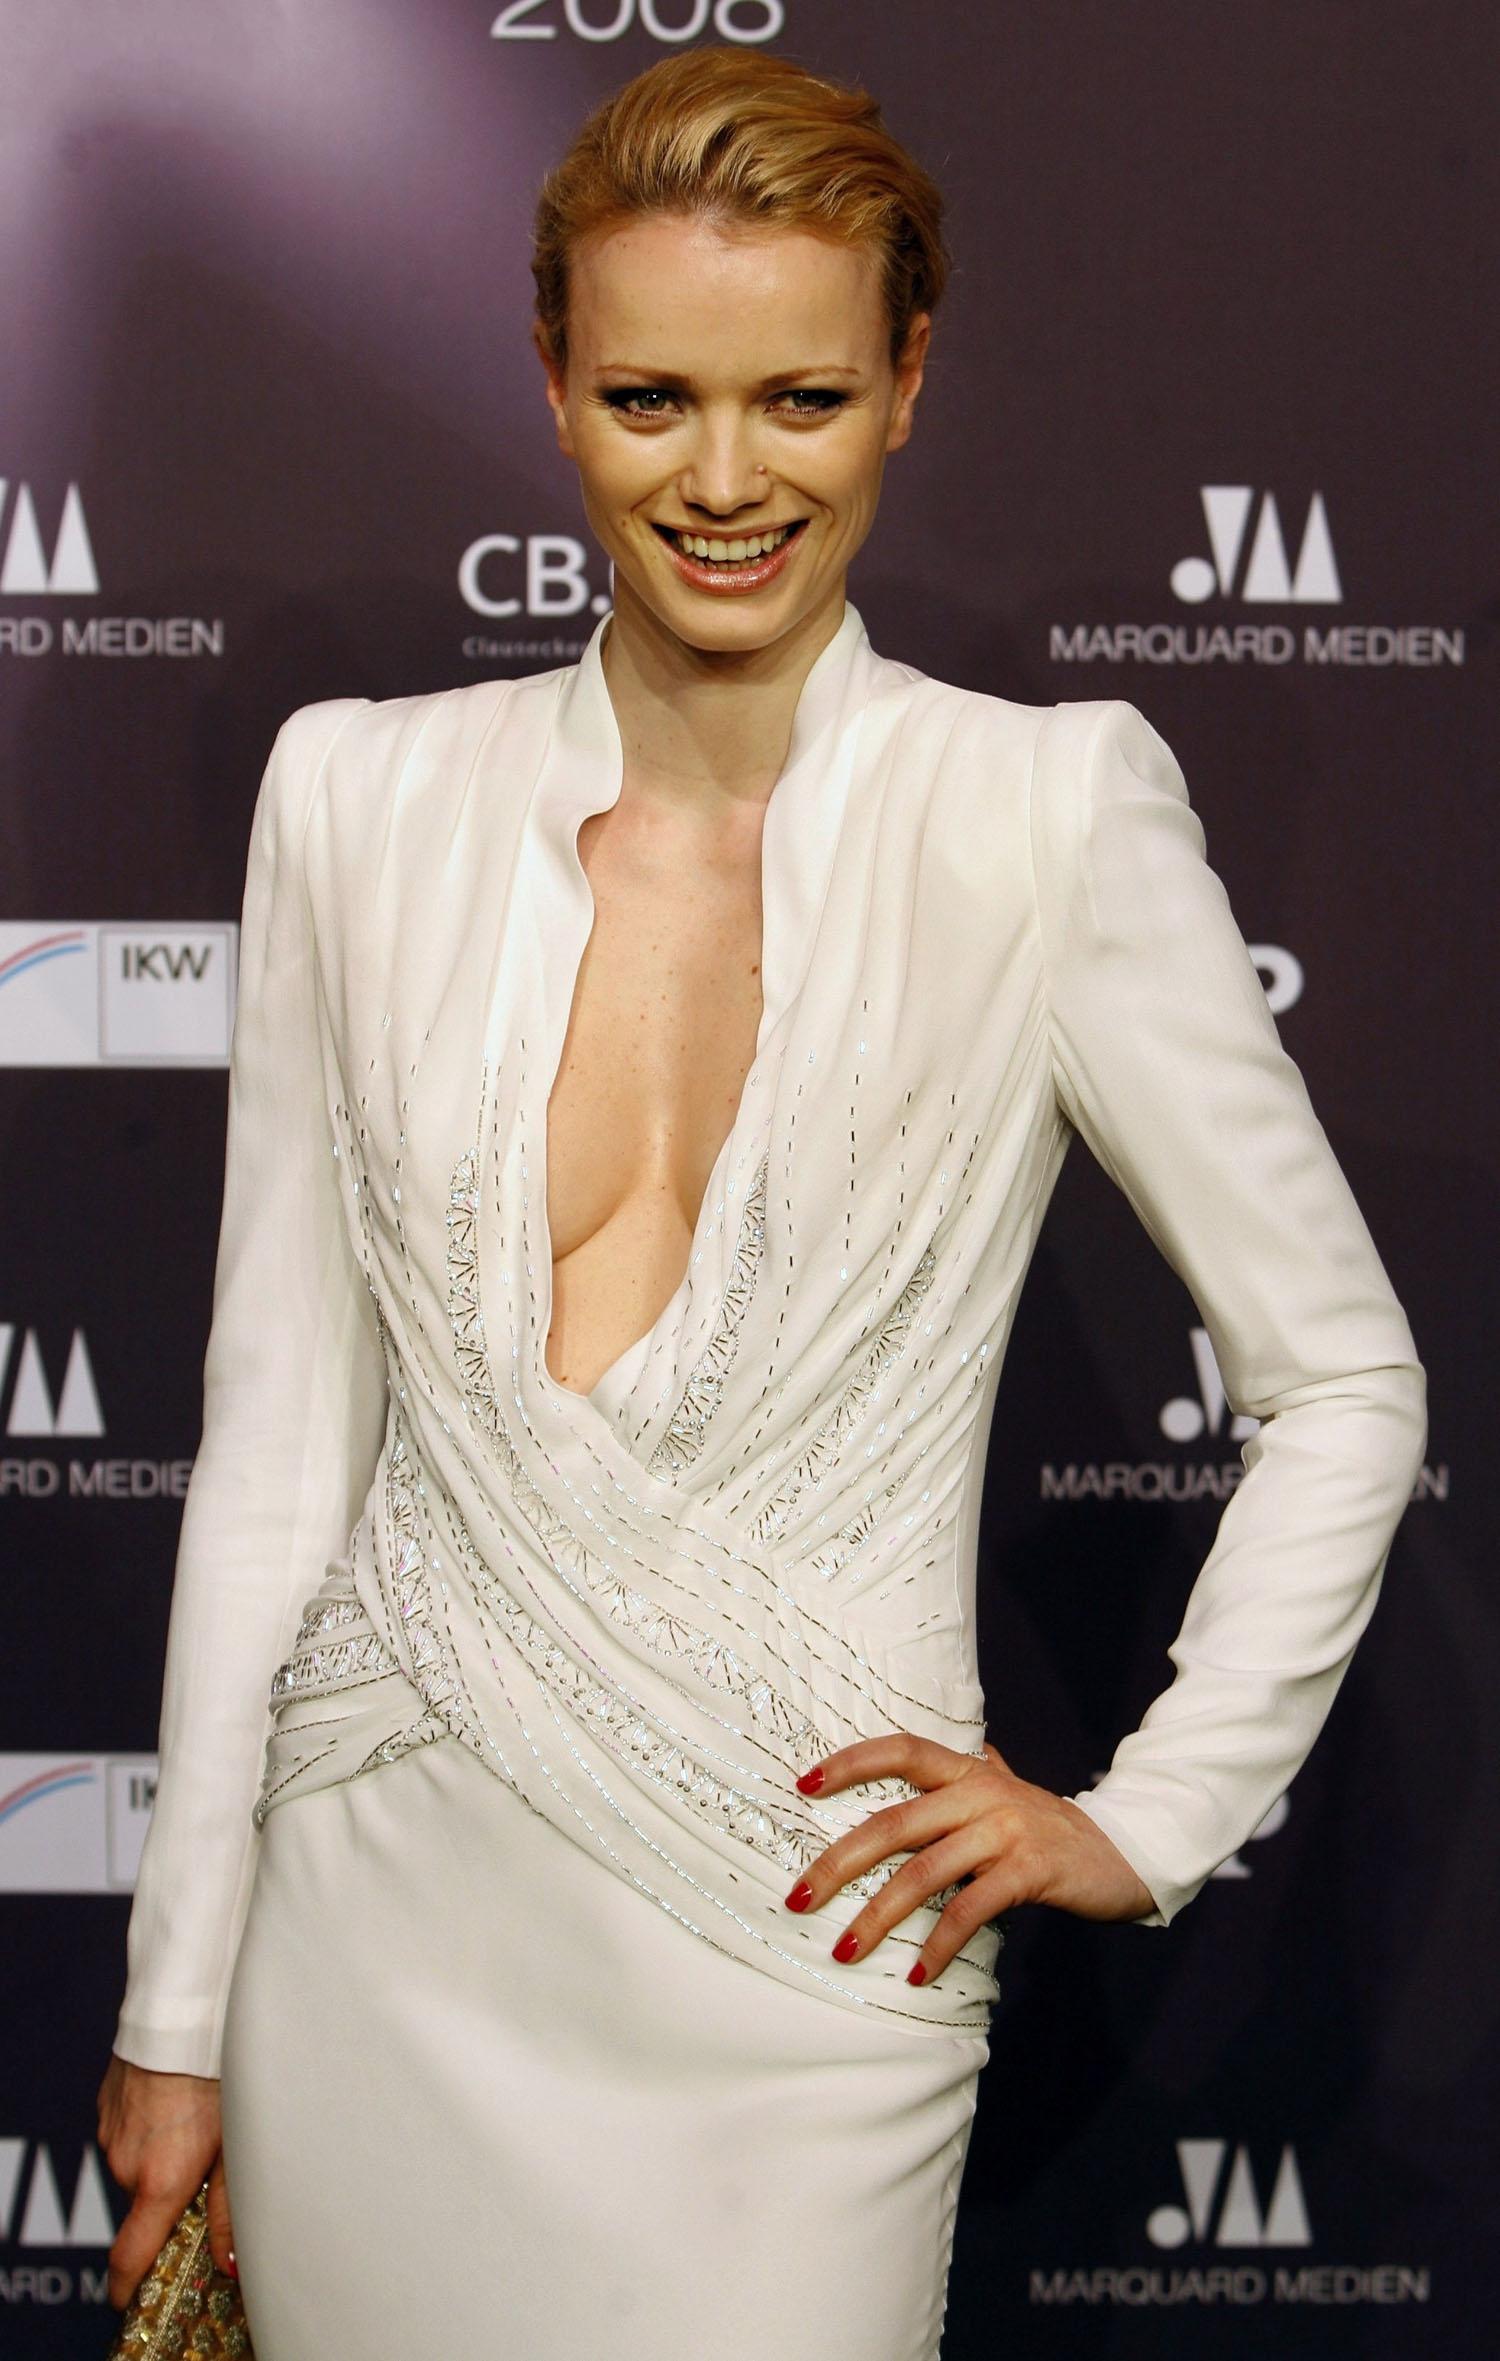 Франциска Кнуппе голая. Фото - 7